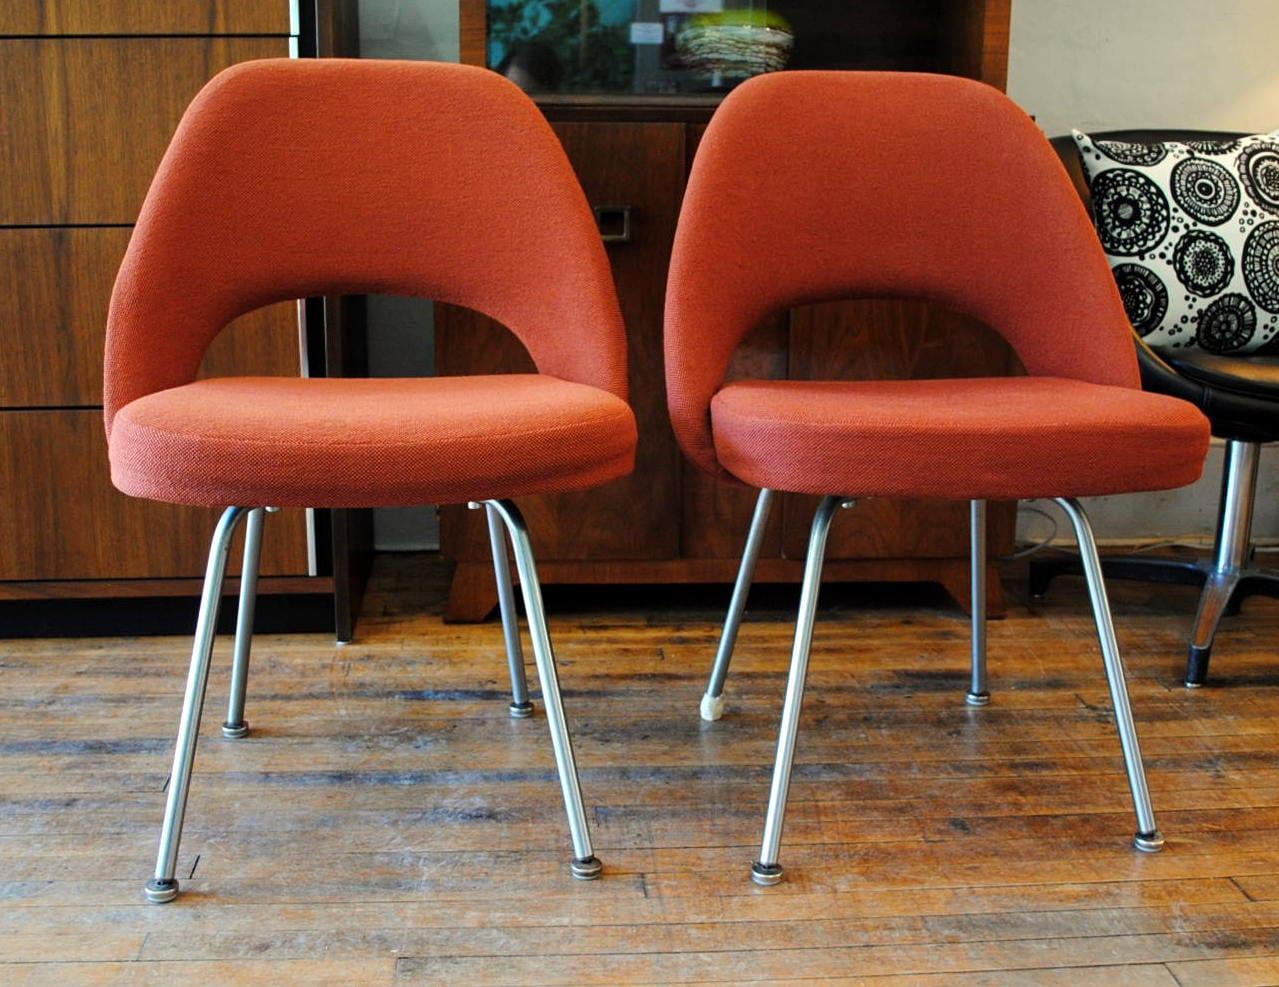 Vintage Knoll Executive Armless Chairs By Eero Saarinen Circa